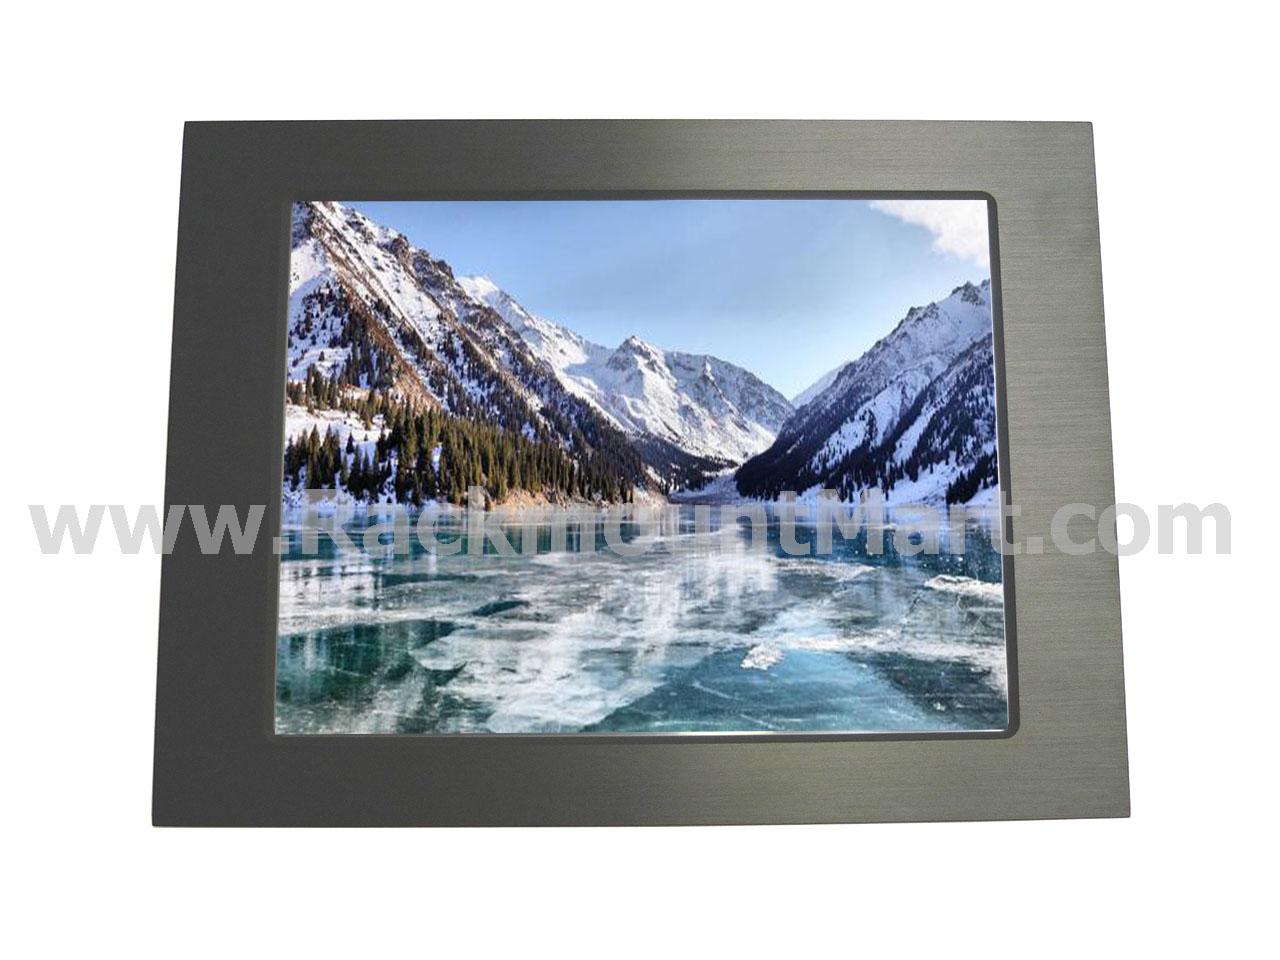 Id 3 15a Aluminum Front Bezel 15 Industrial Panel Mount